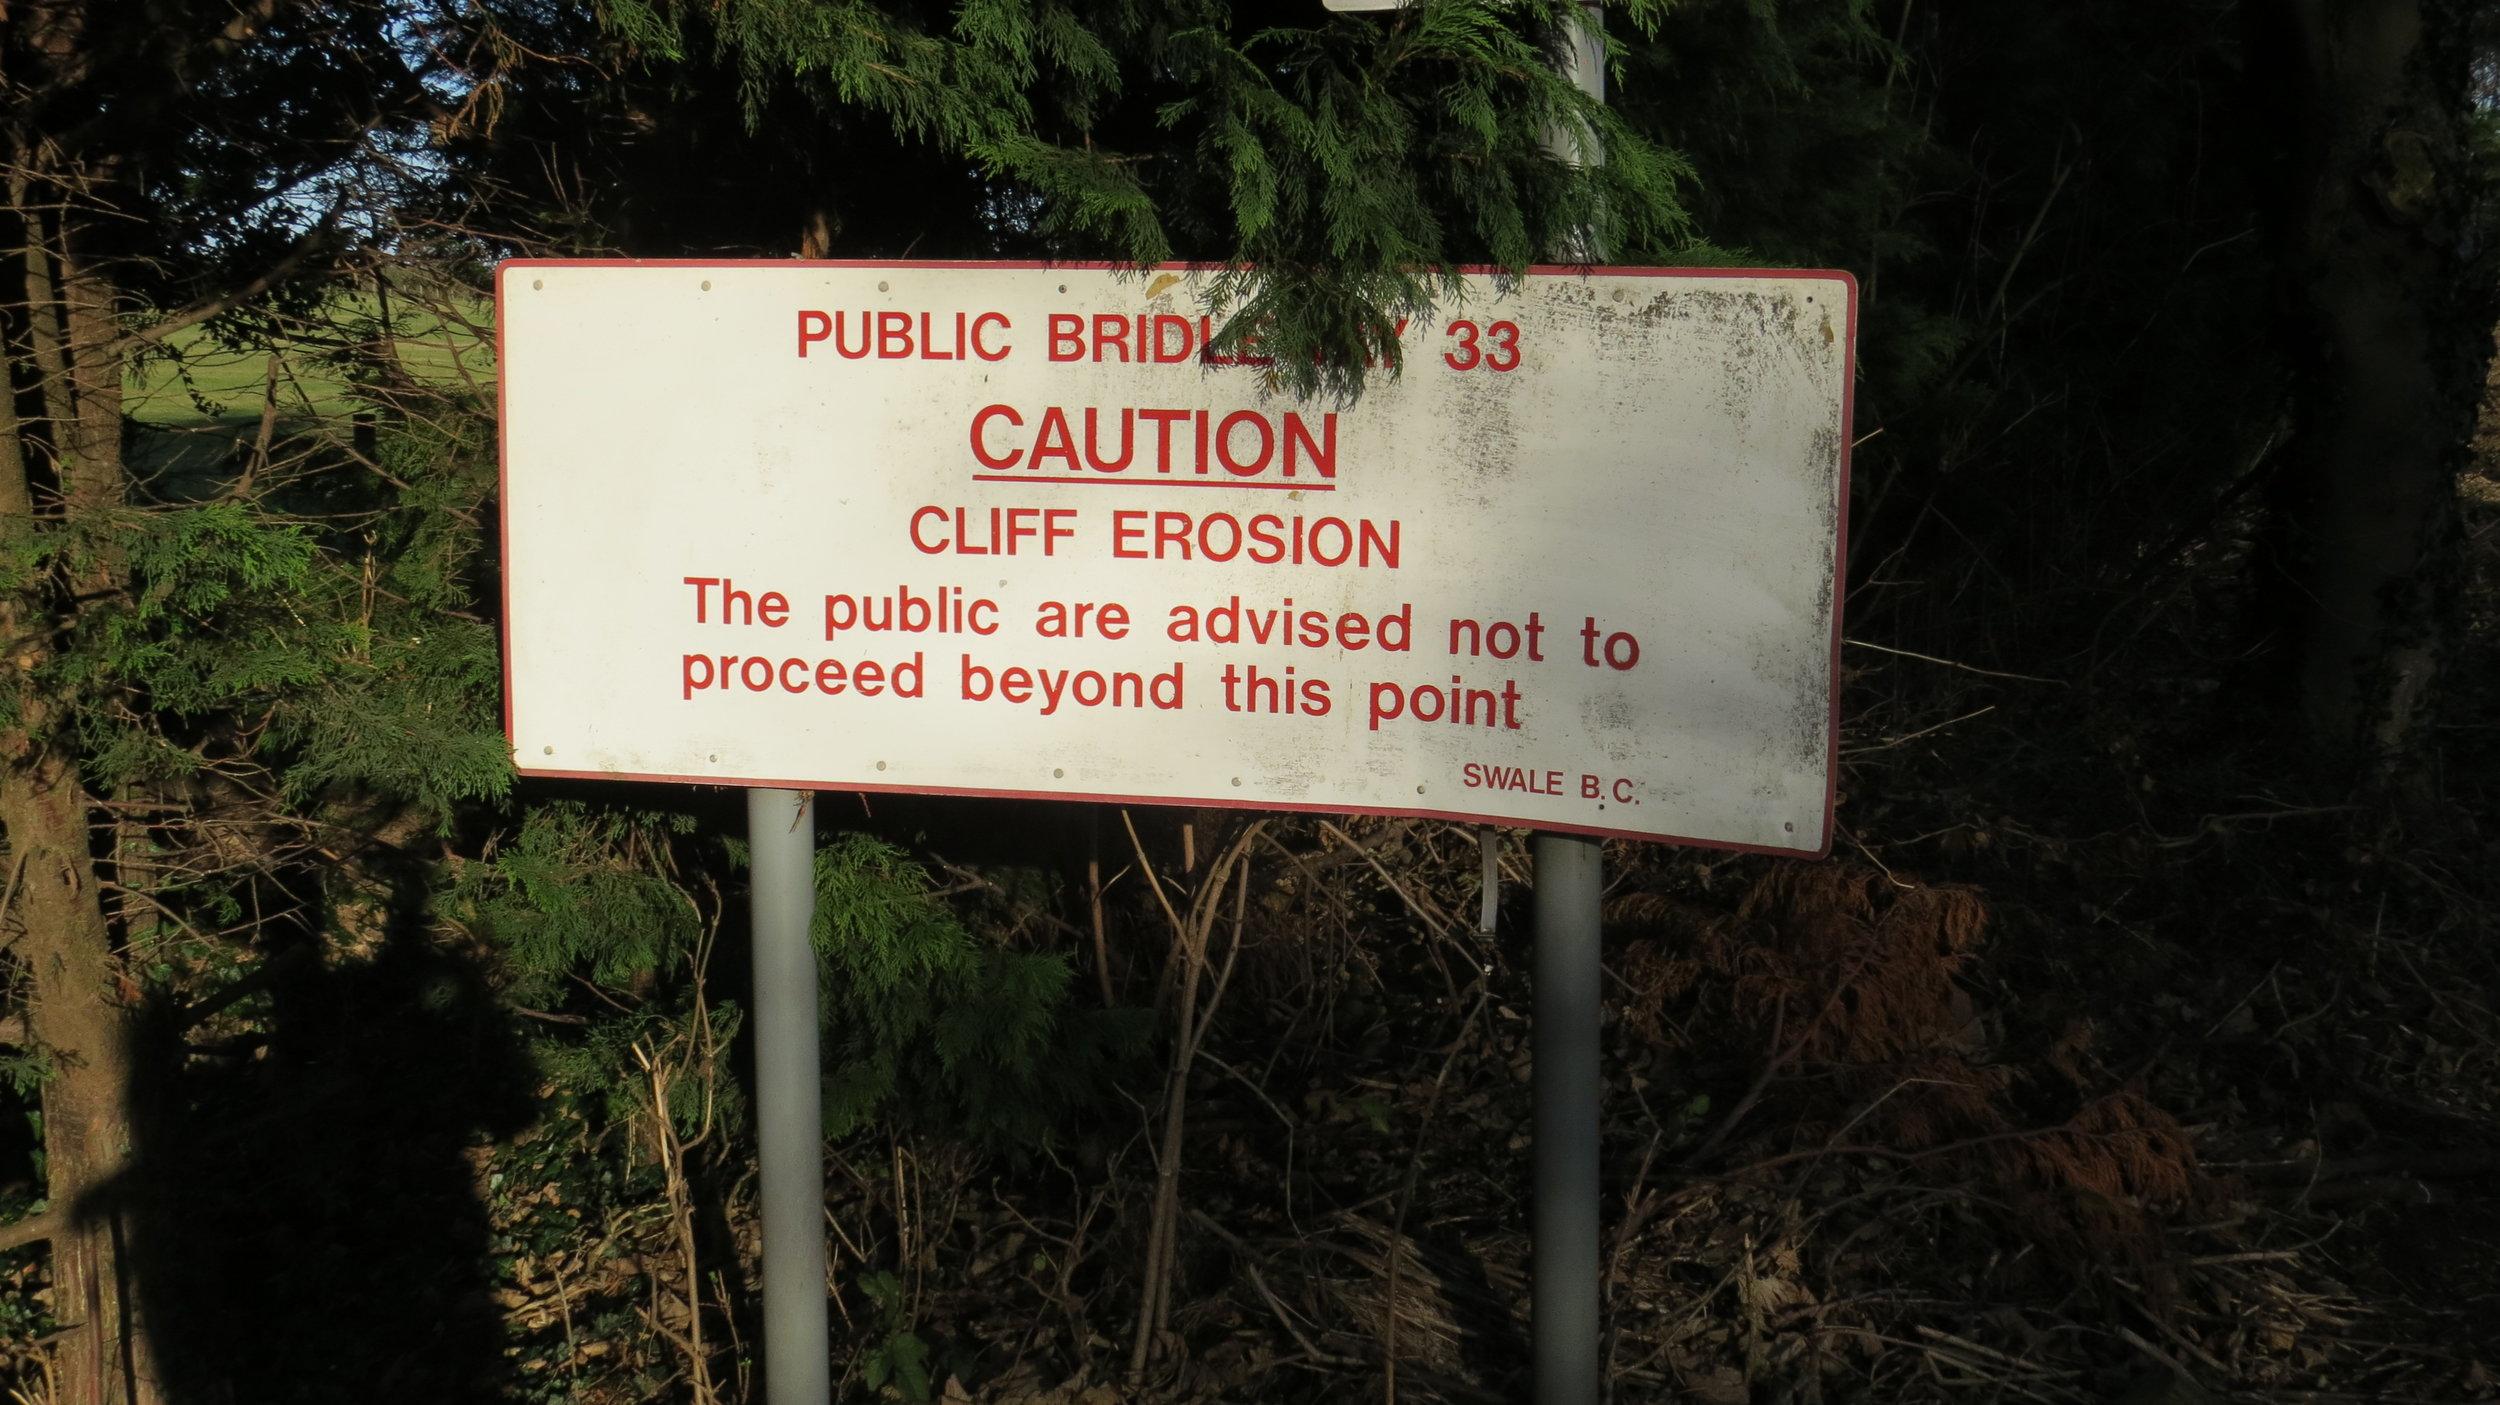 Blocked by erosion